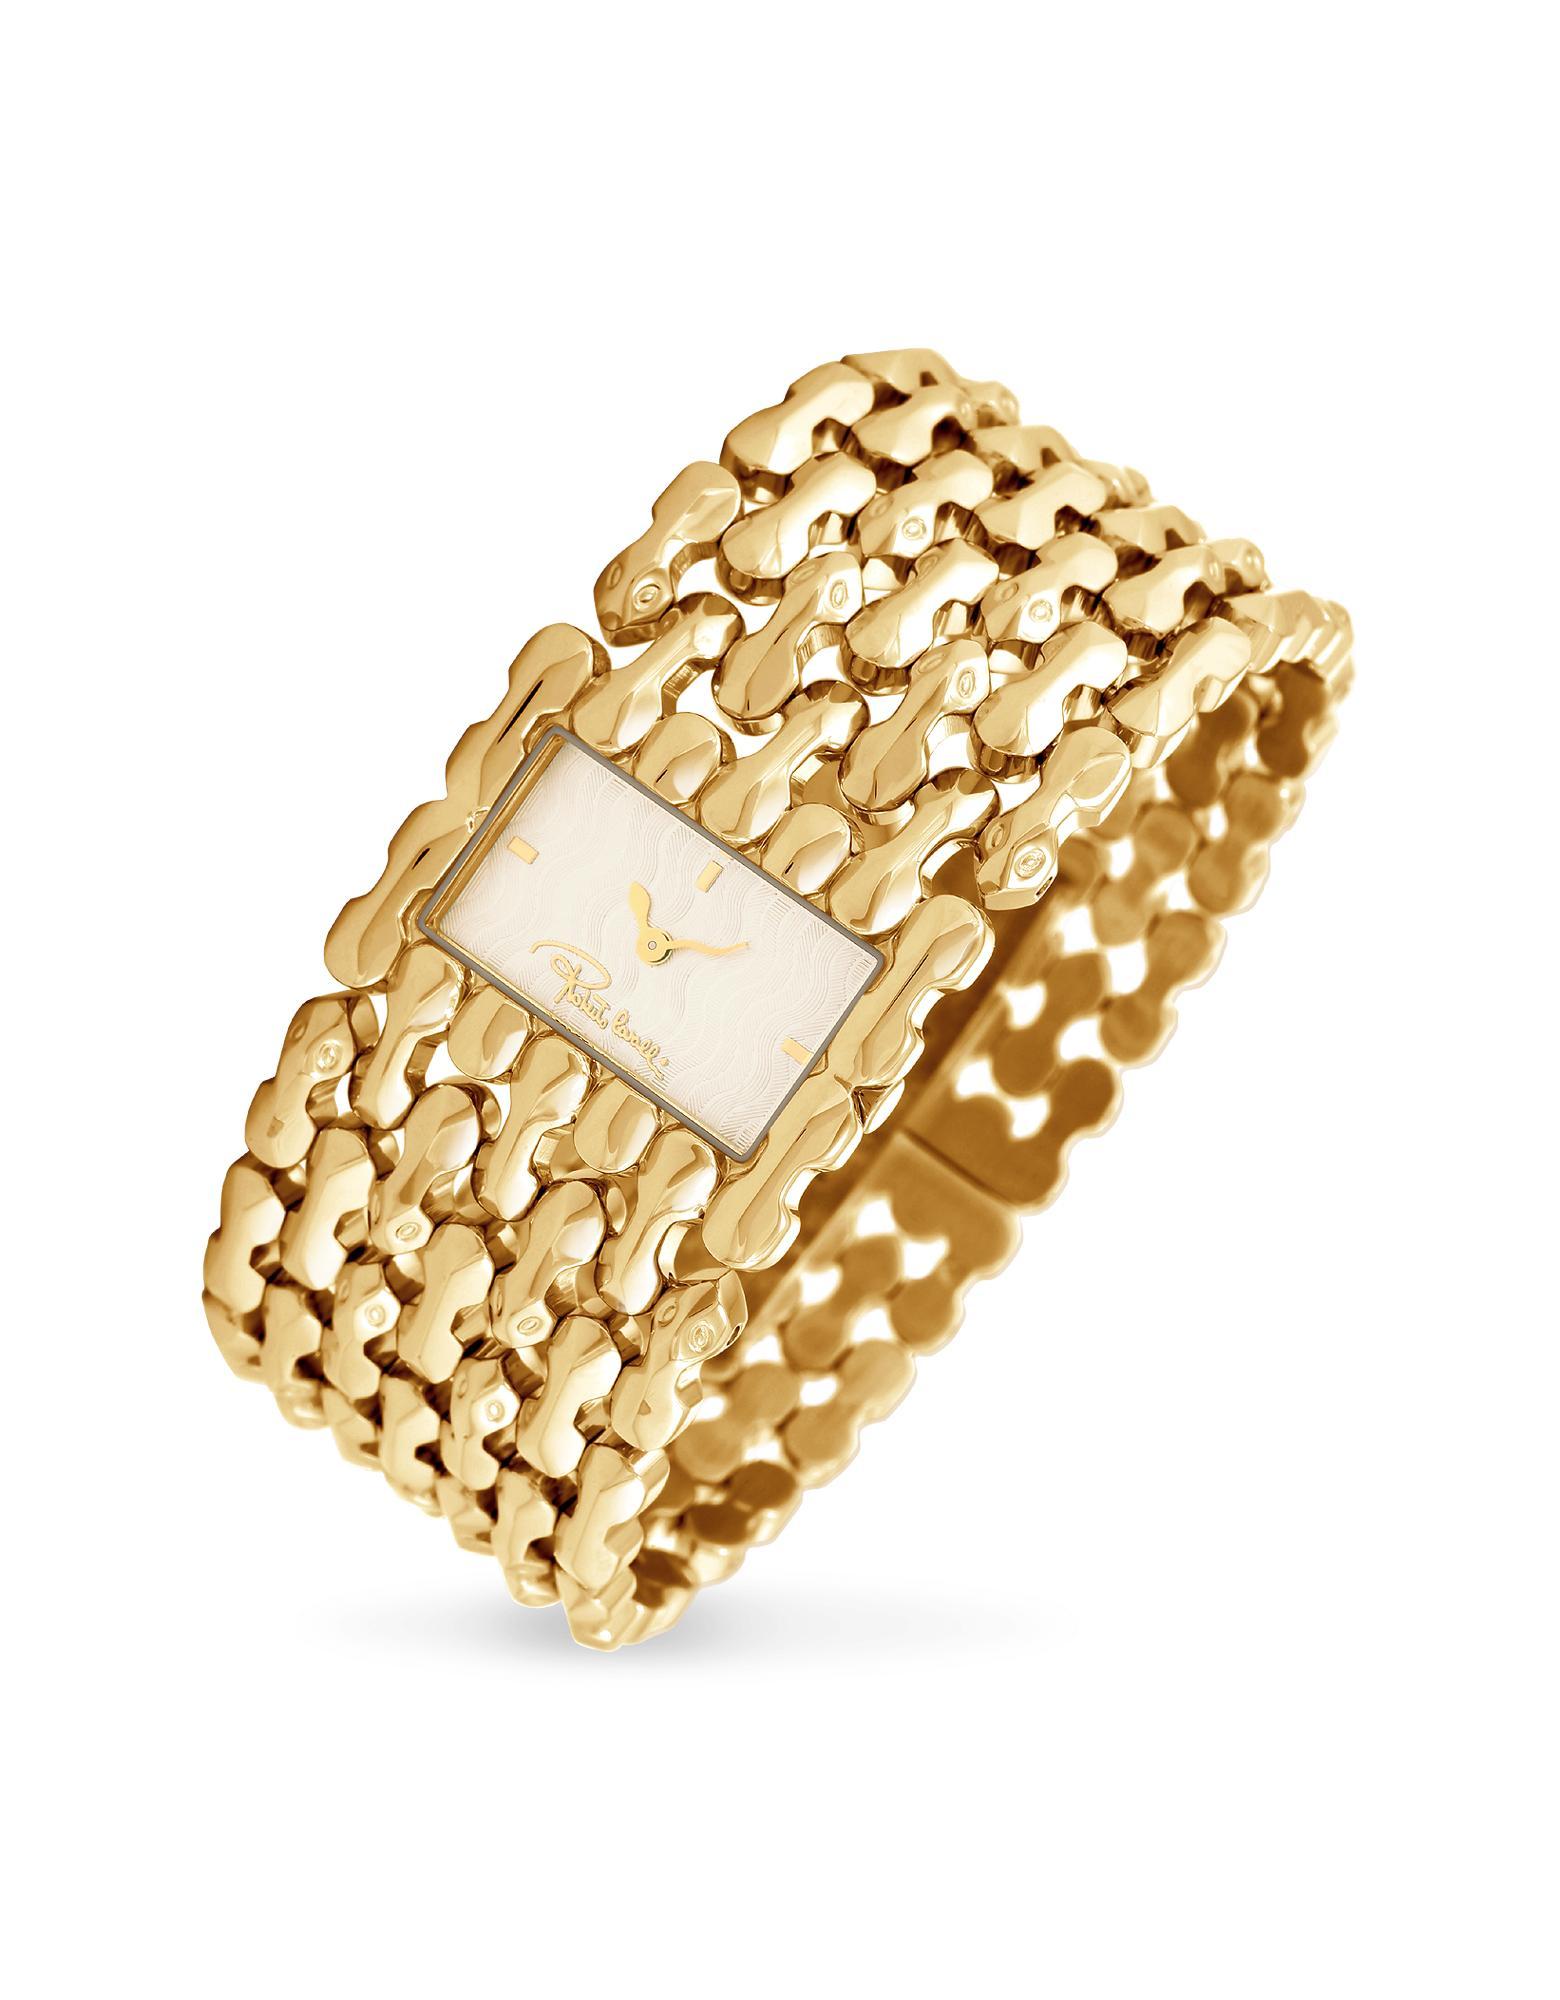 Roberto Cavalli Oryza - Gold Plated Signature Bracelet Dress Watch